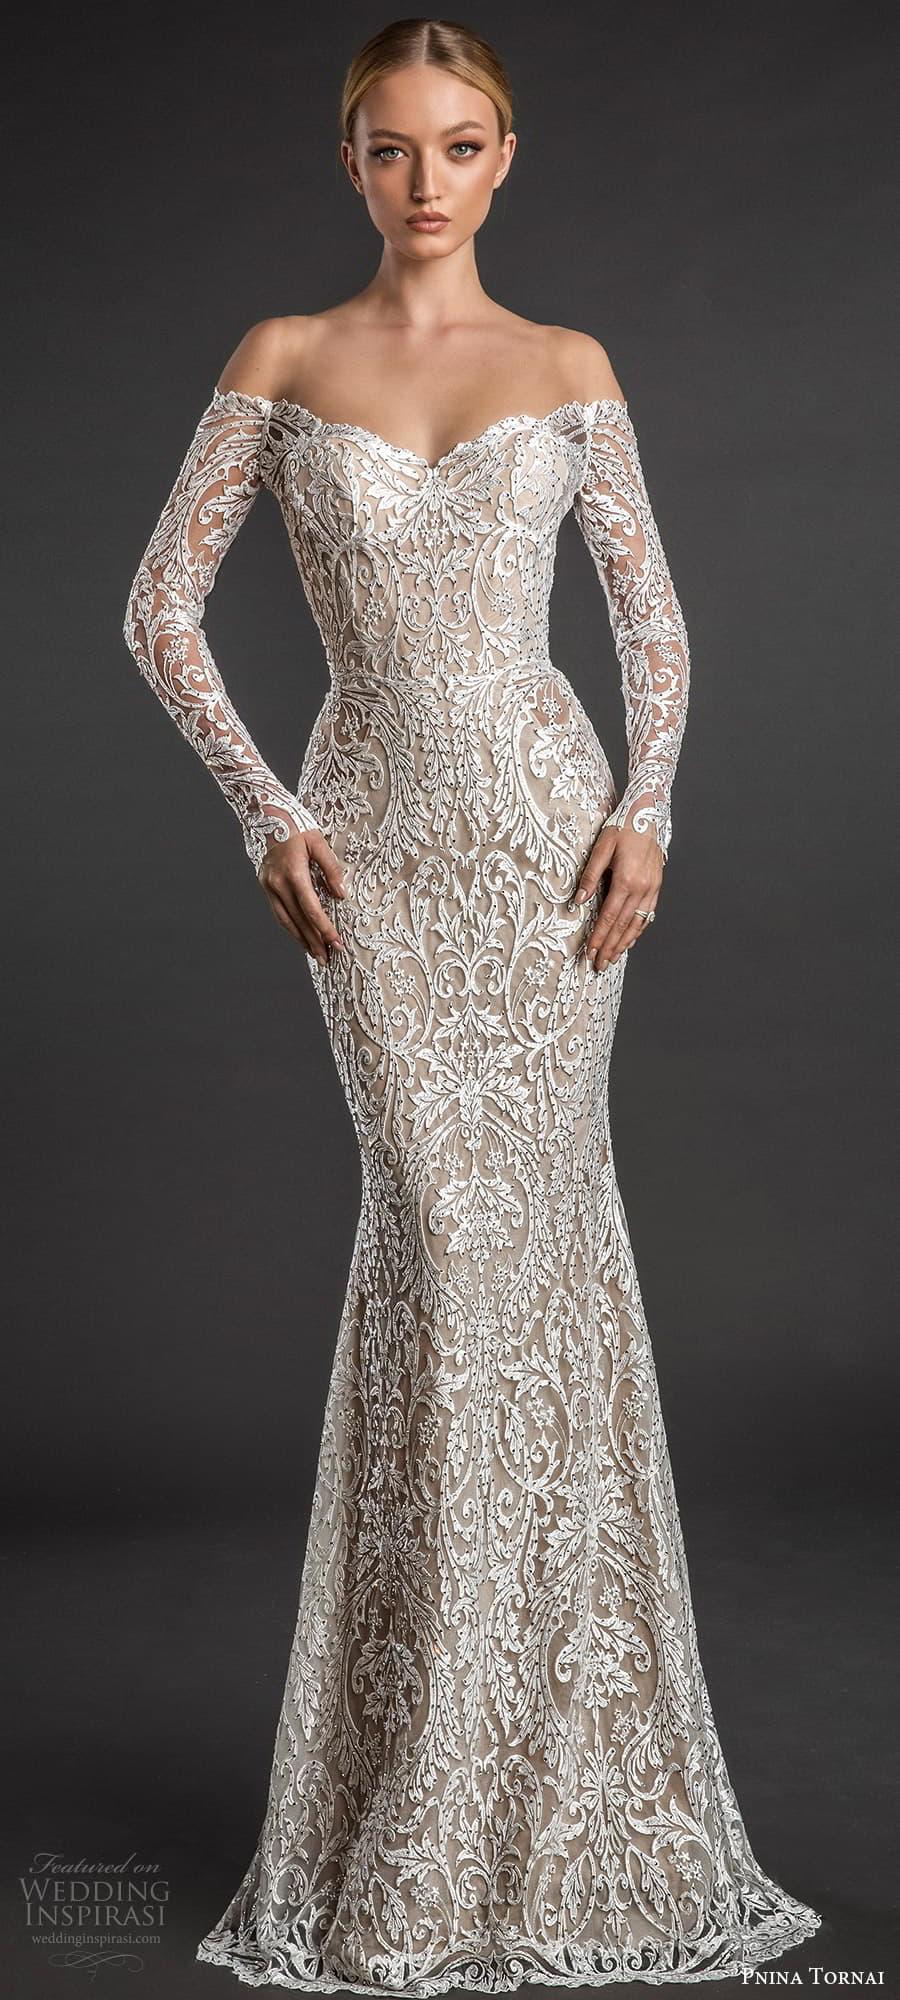 pnina tornai 2022 love bridal long sleeve off shoulder sweetheart neckline fully embellished lace sheath wedding dress chapel train (2) lv